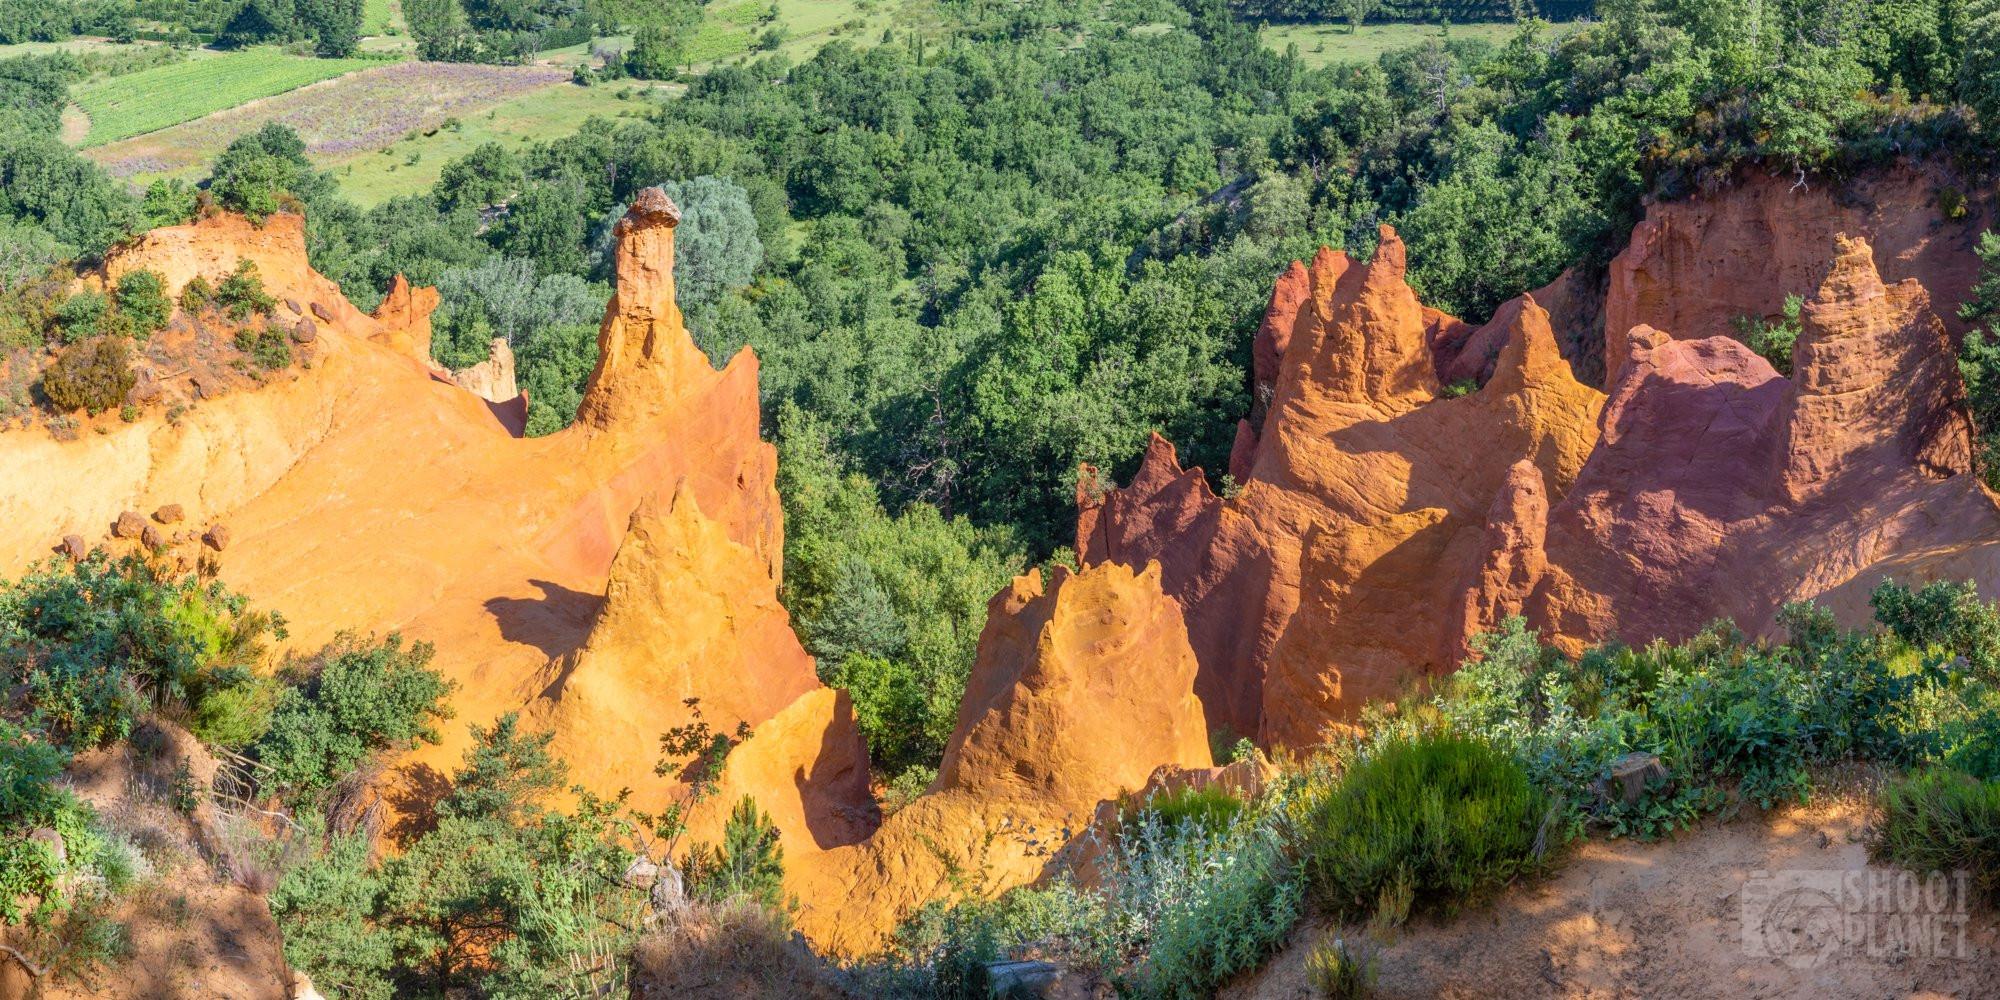 Colorado Provençal rocks in Vaucluse, France